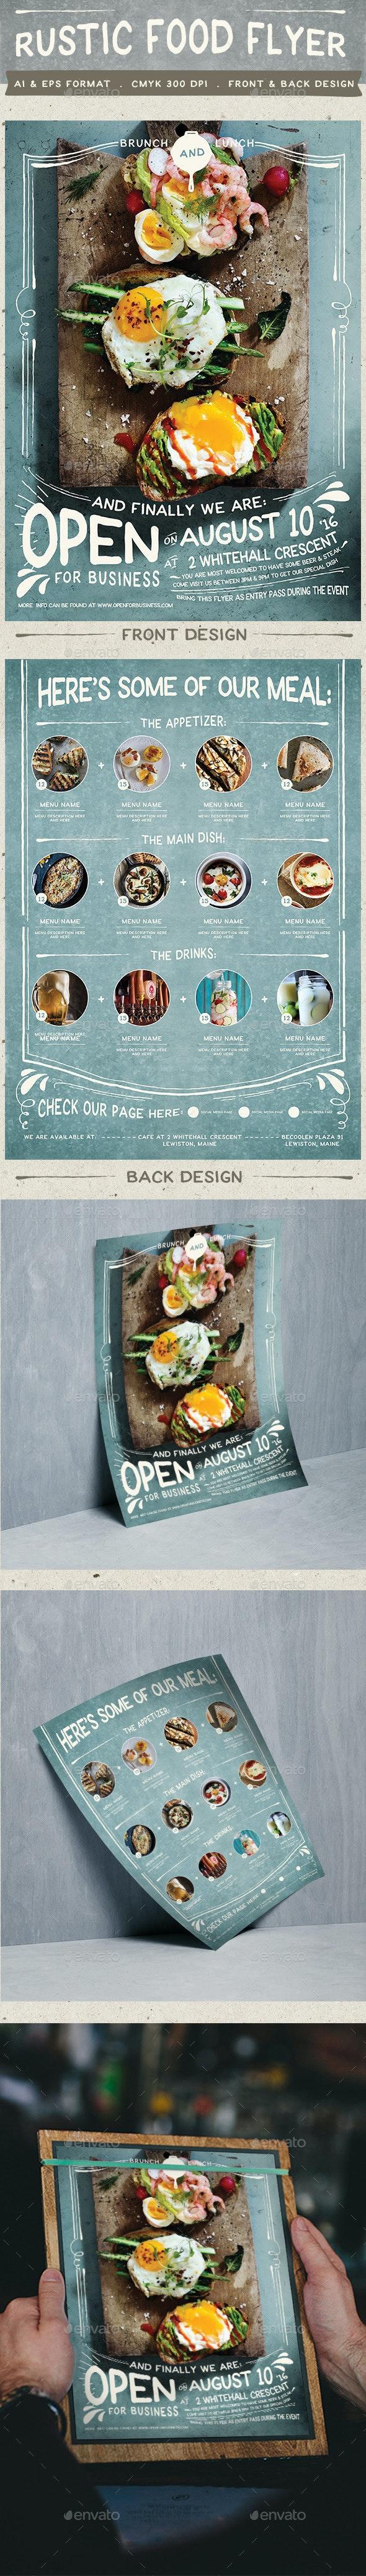 Rustic Food Promo Flyer - Restaurant Flyers